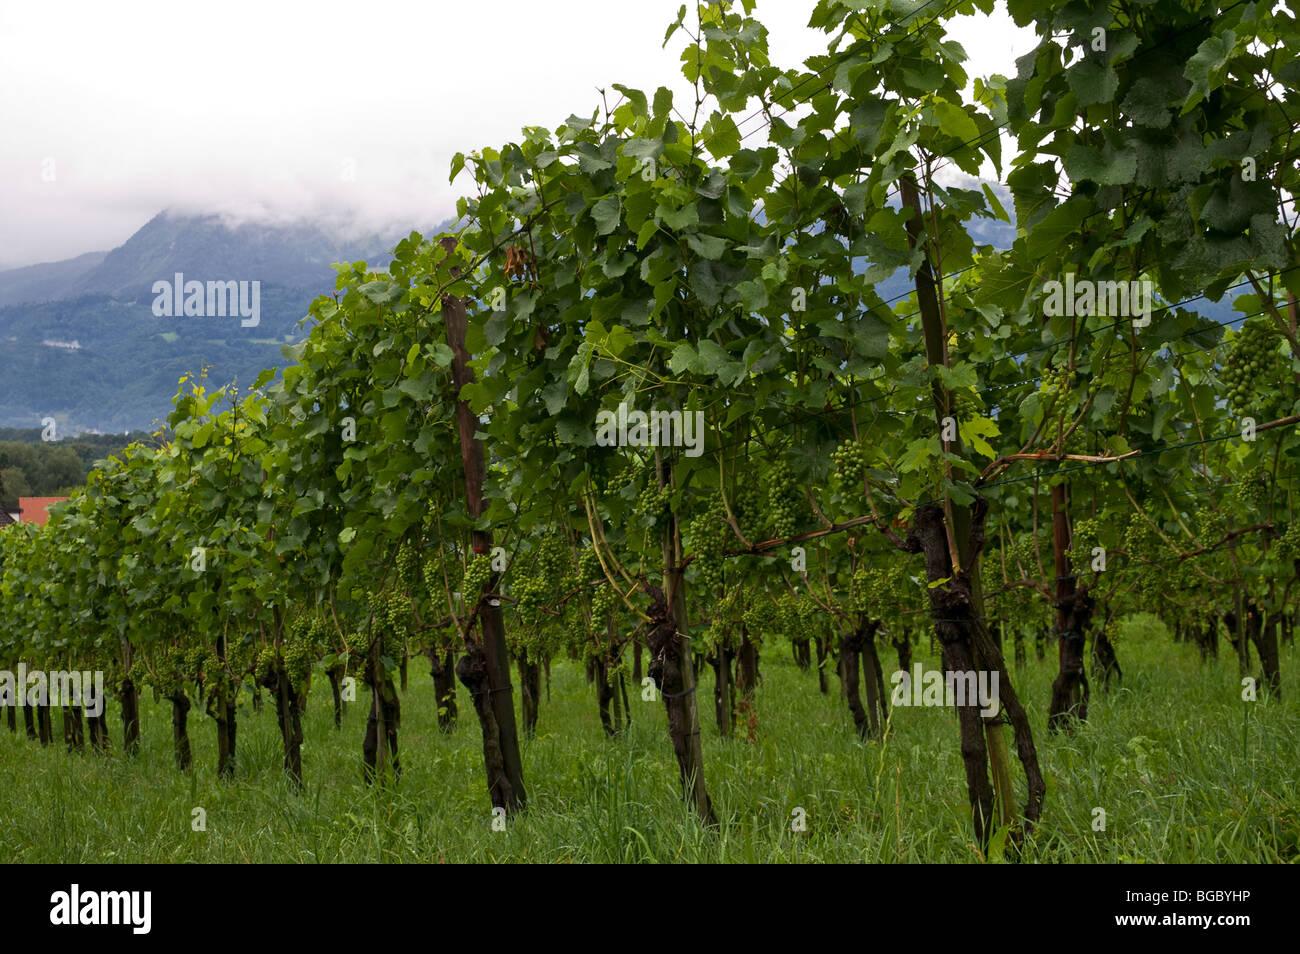 Vineyards in Vaduz on a rainy day Stock Photo